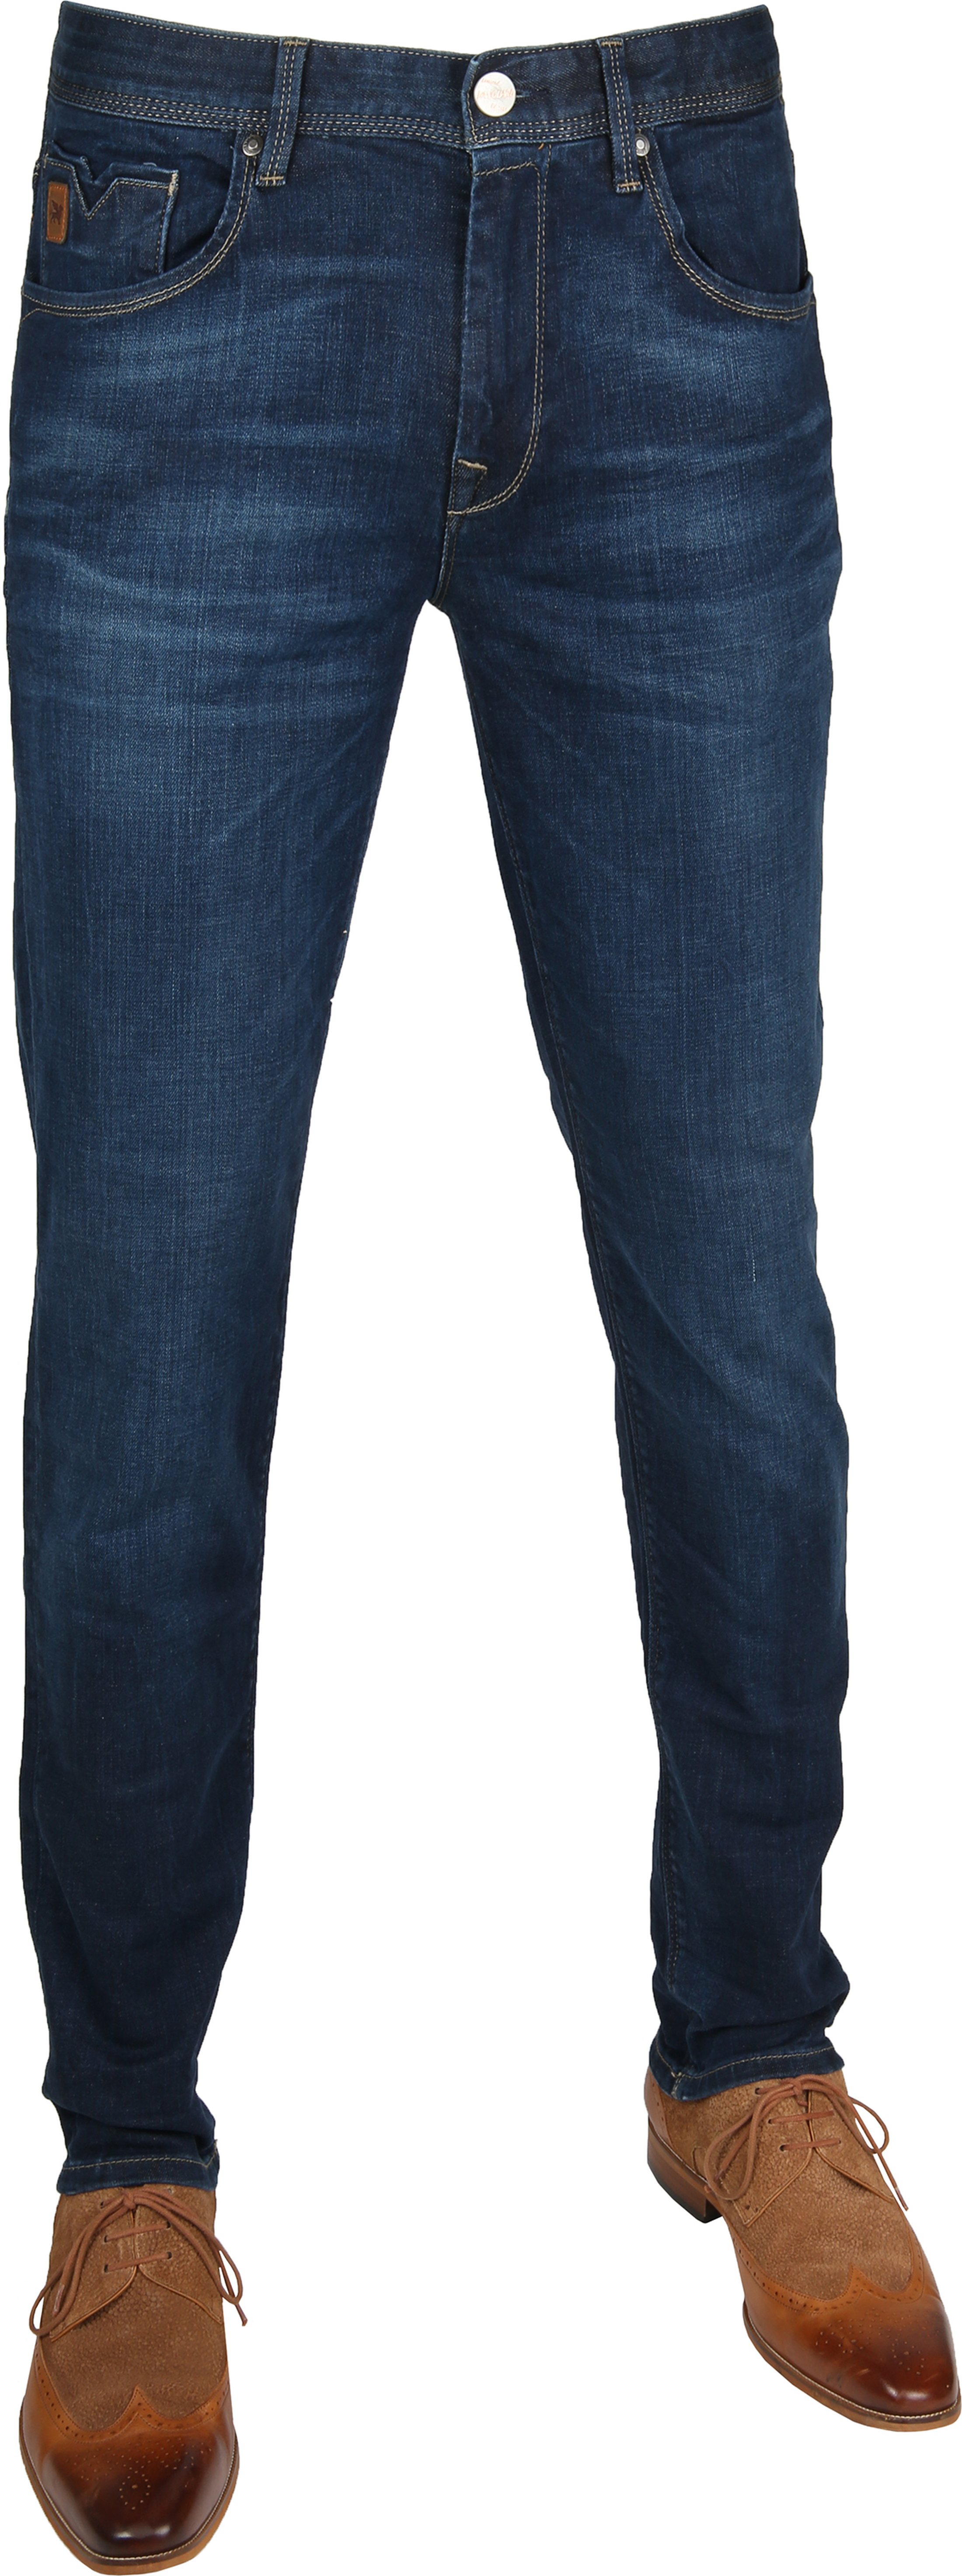 Vanguard Jeans V7 Rider Pure Blue foto 0